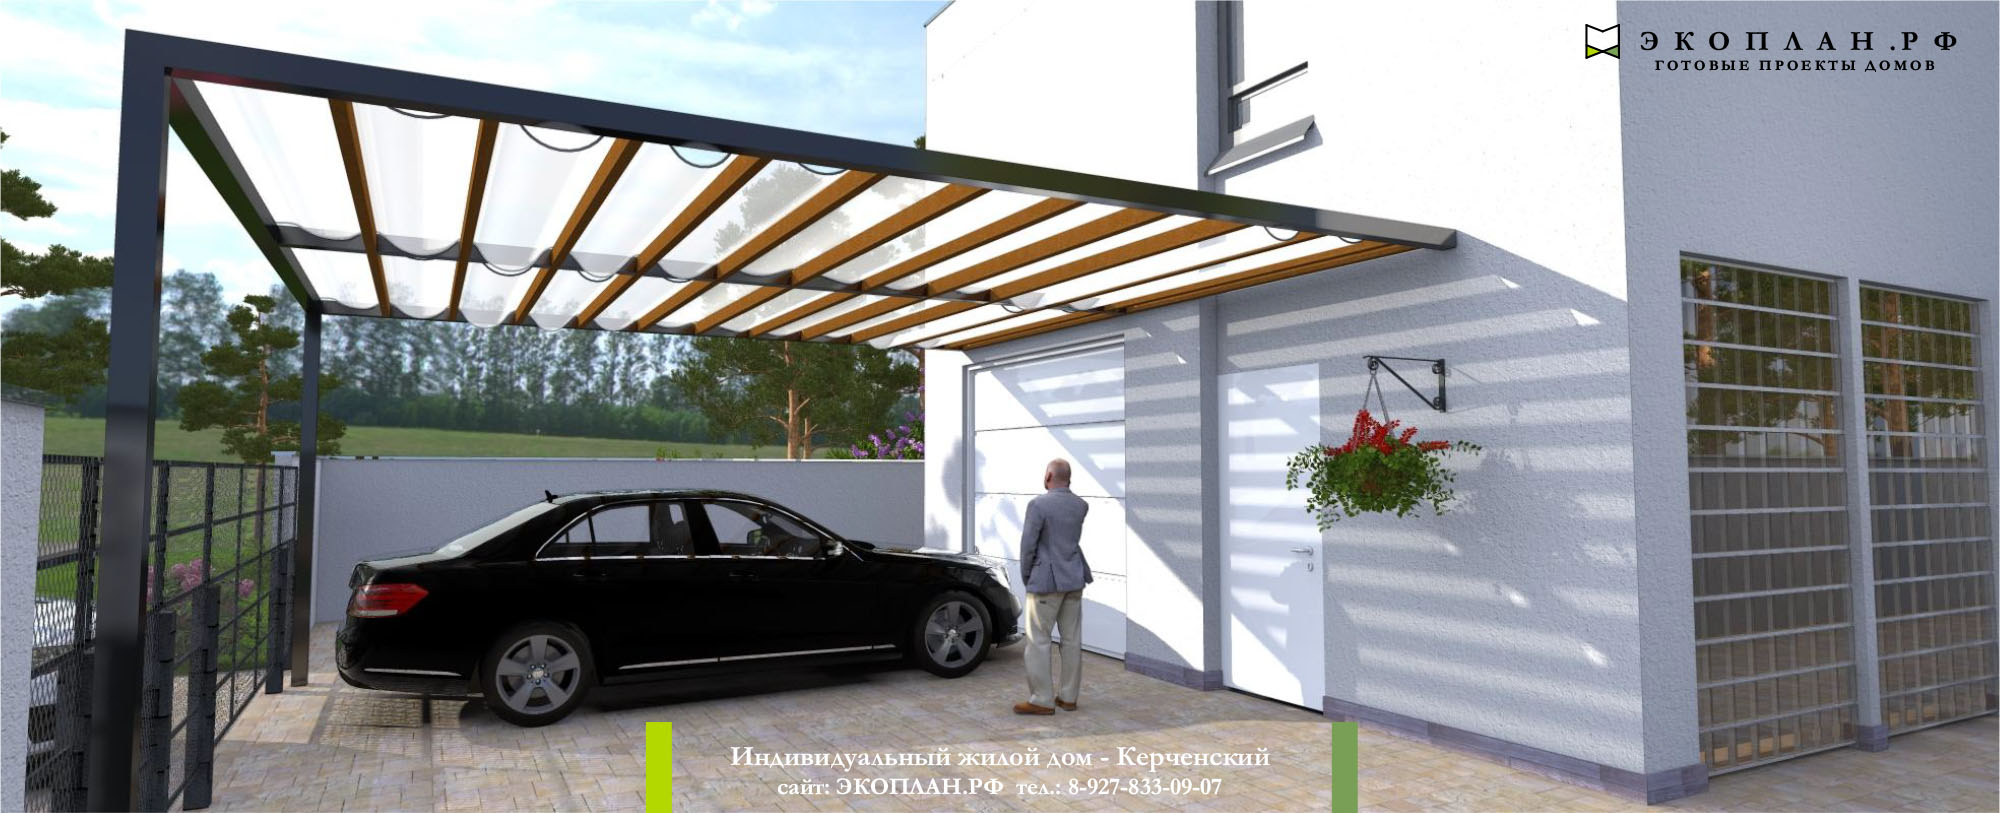 Керченский - Экоплан фасад